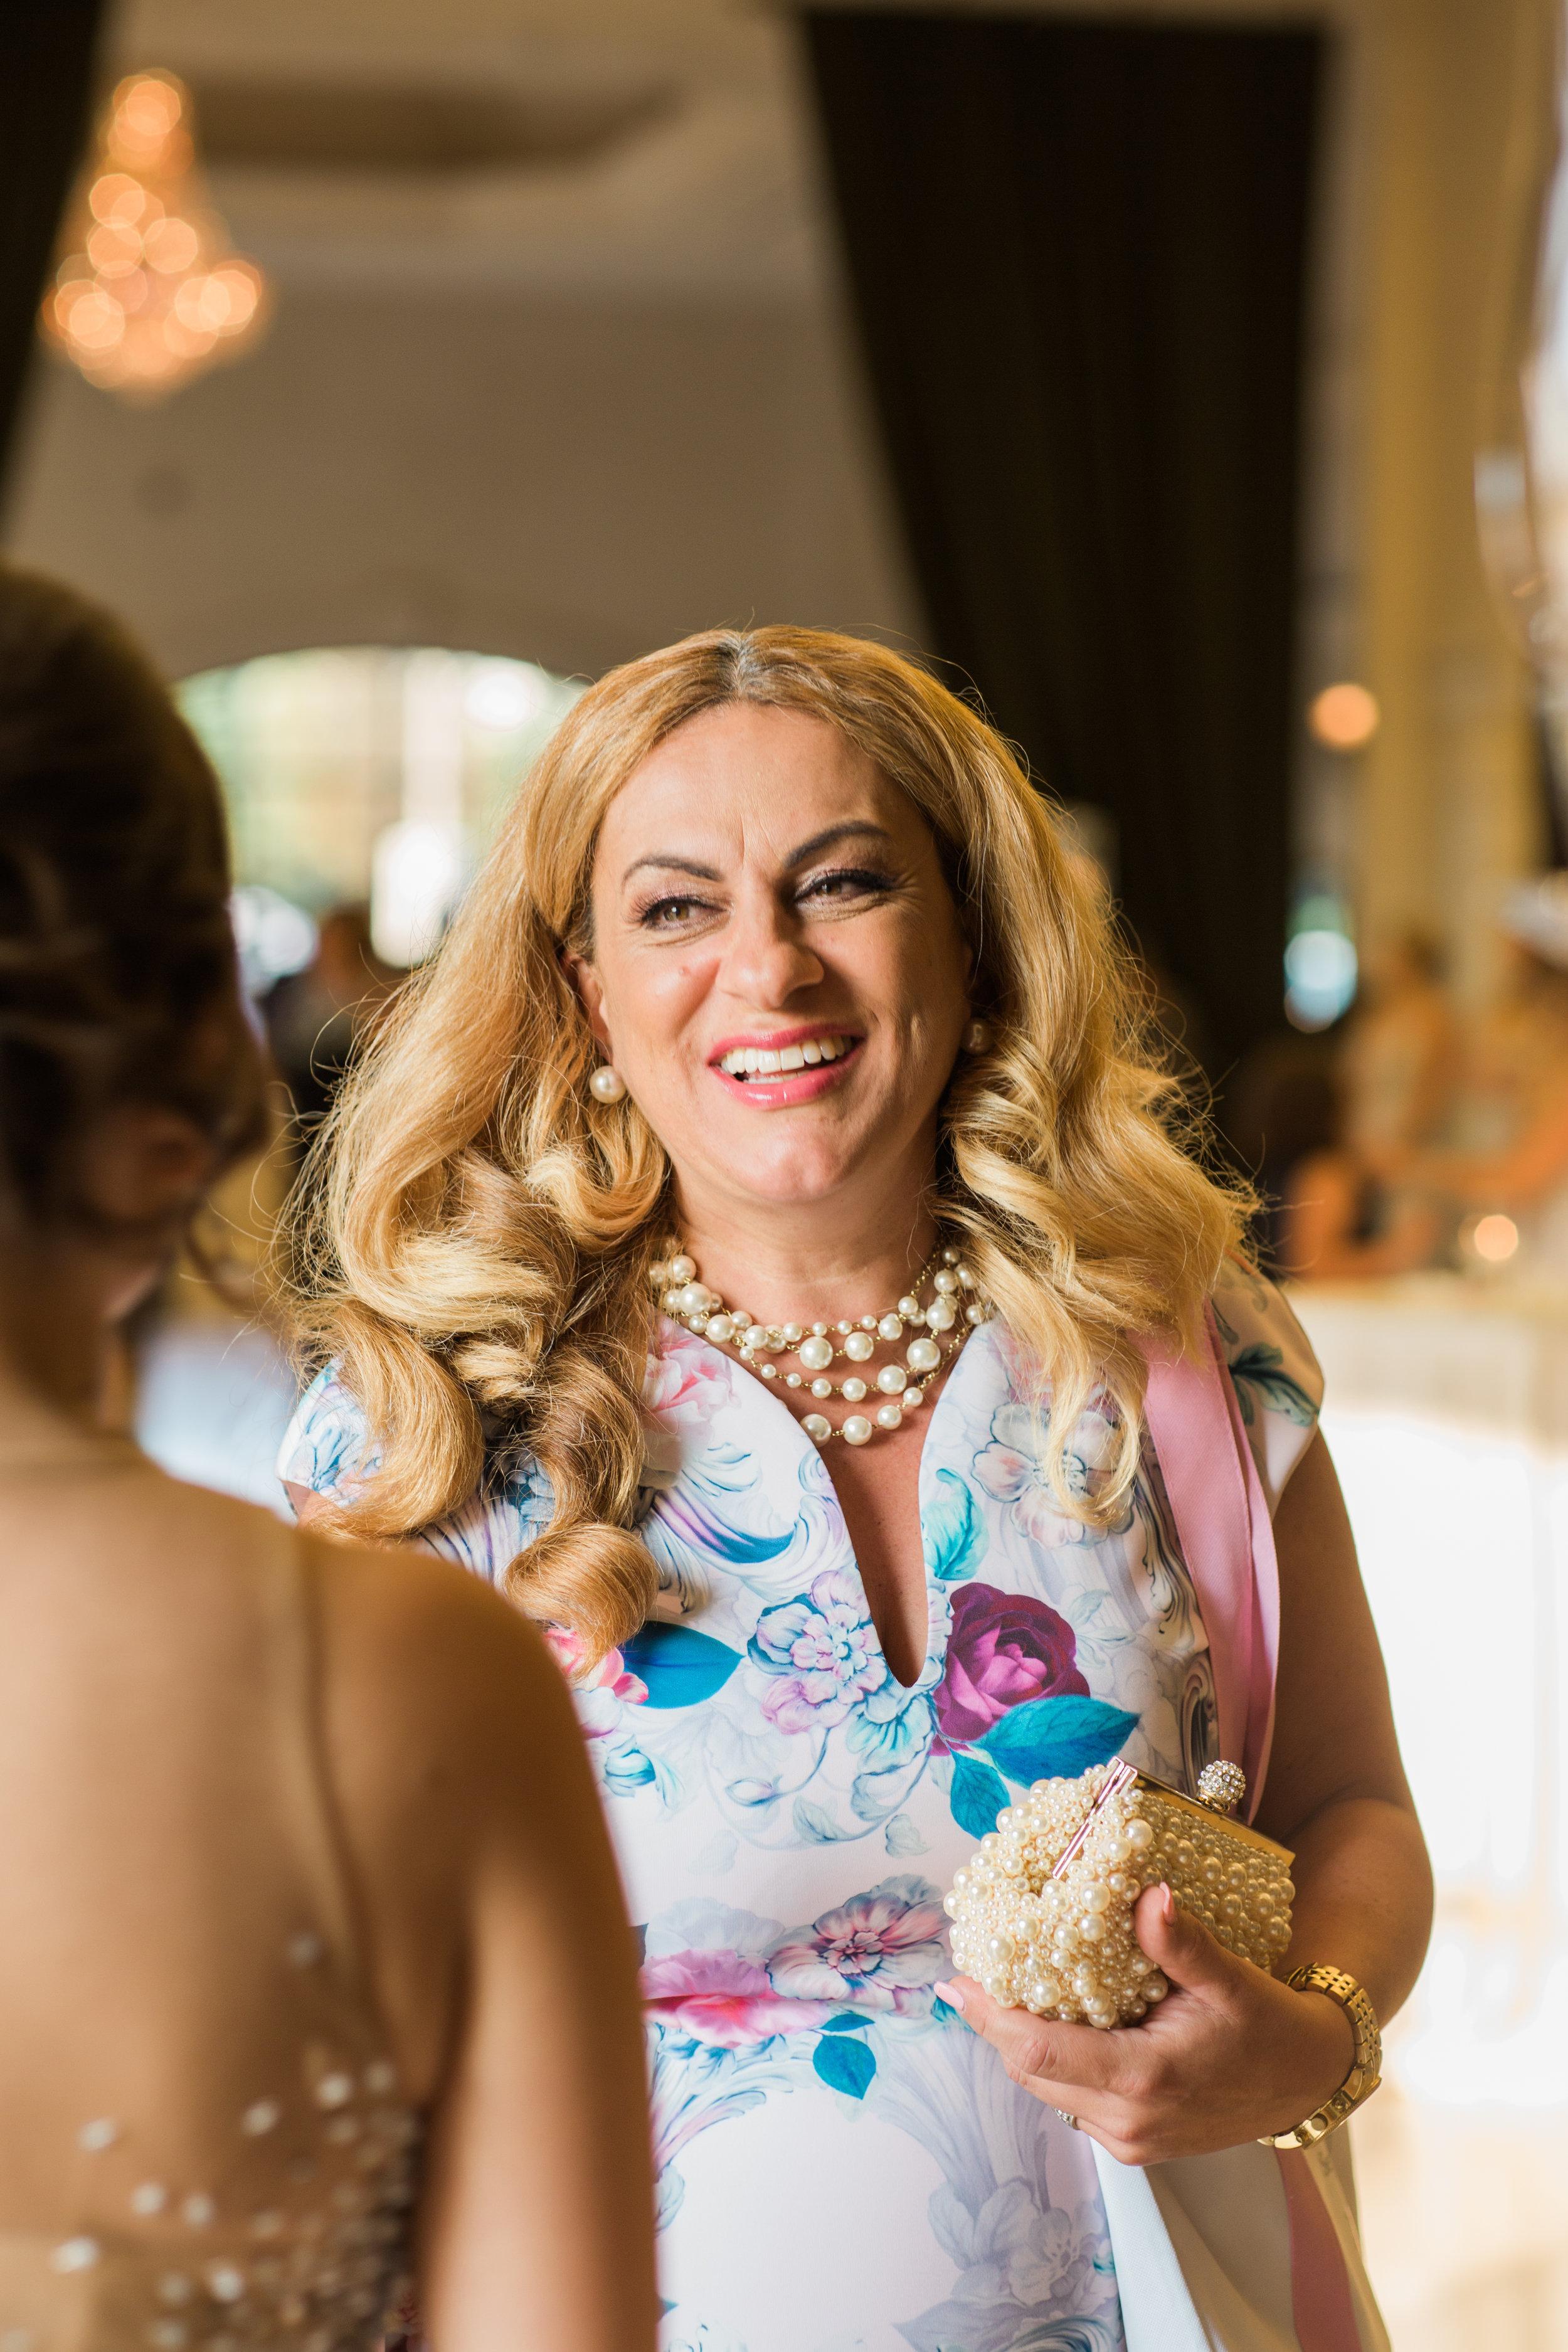 Danielle-Giroux-Amir-Golbazi-Toronto-Wedding-Photographer-Bellvue-Manor_DeLuca_2-130.jpg